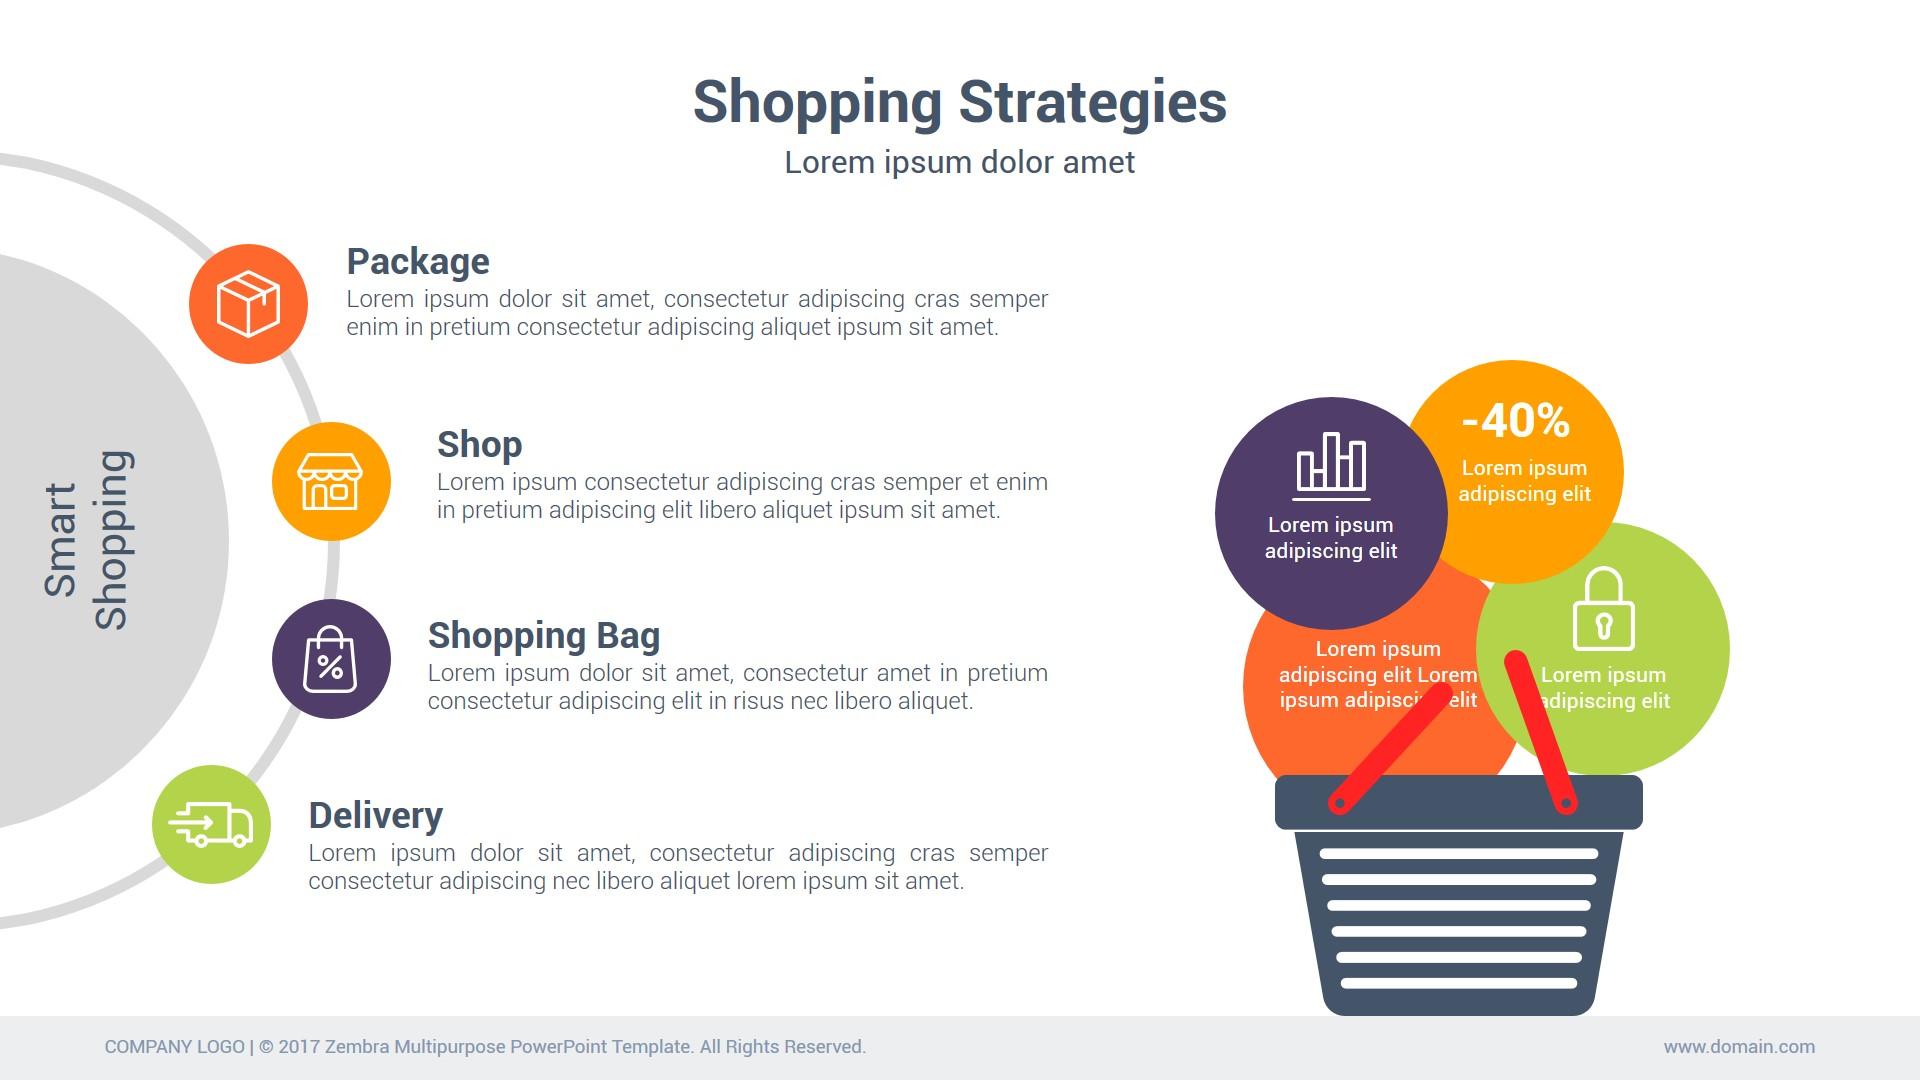 Zembra | MultiPurpose PowerPoint Template